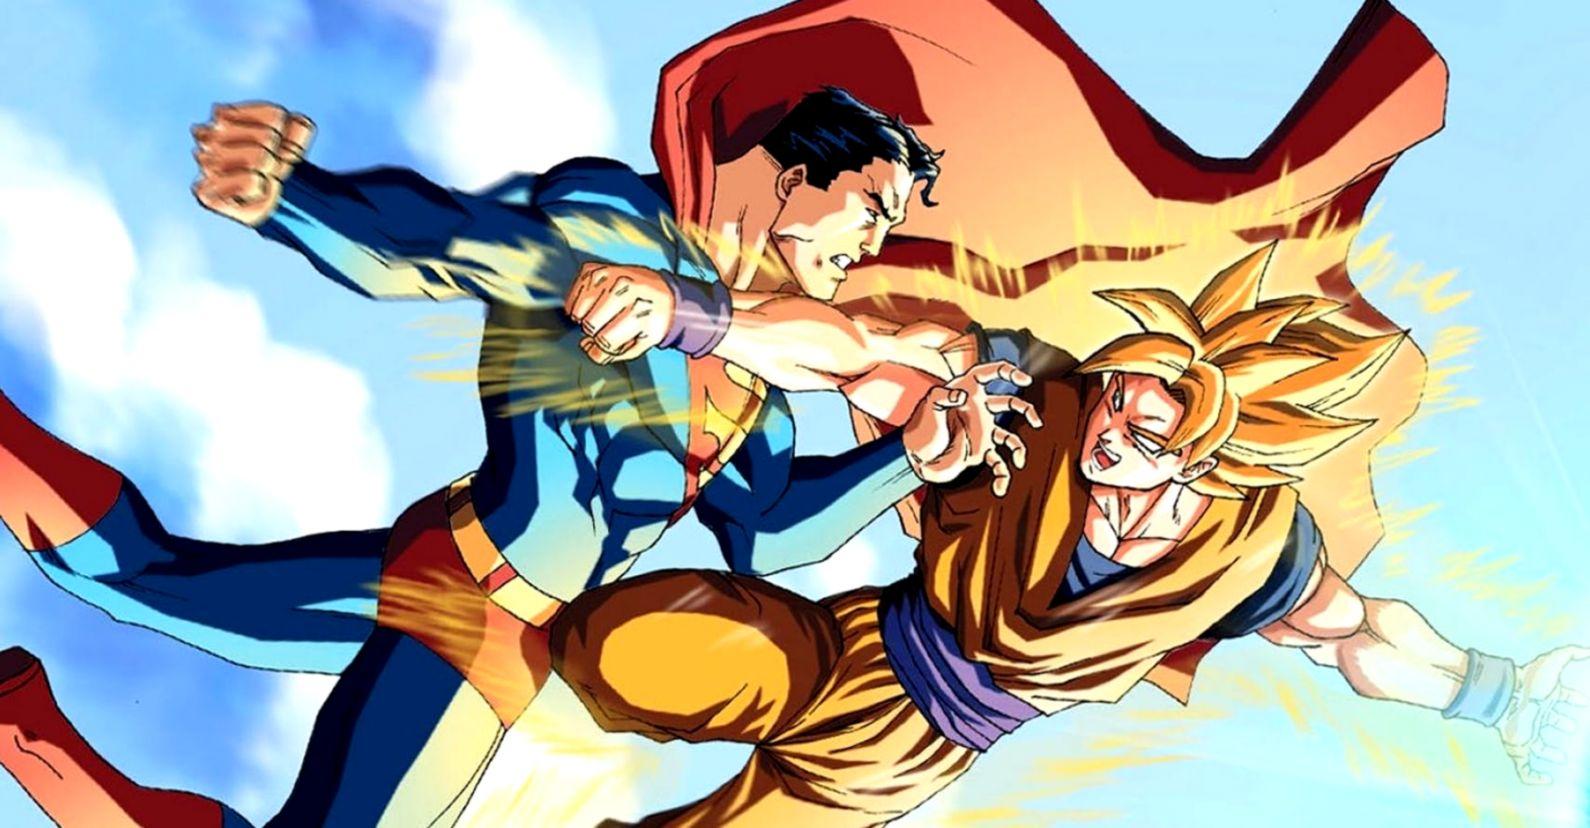 Naruto Vs Ryu Breath Of Fire 4 Battles Comic Vine Wallpapers